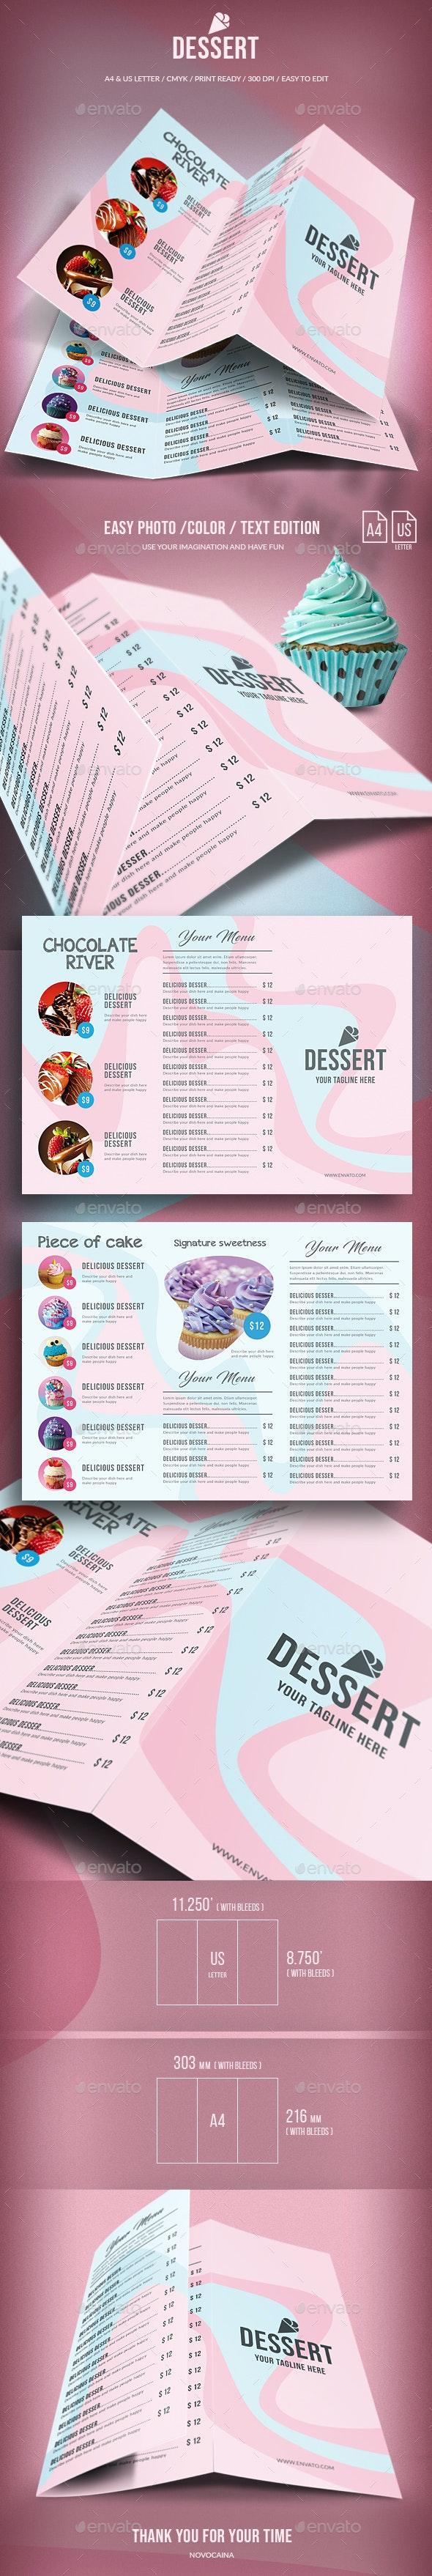 Sweet Dessert Trifold Menu - A4 & US Letter - Food Menus Print Templates